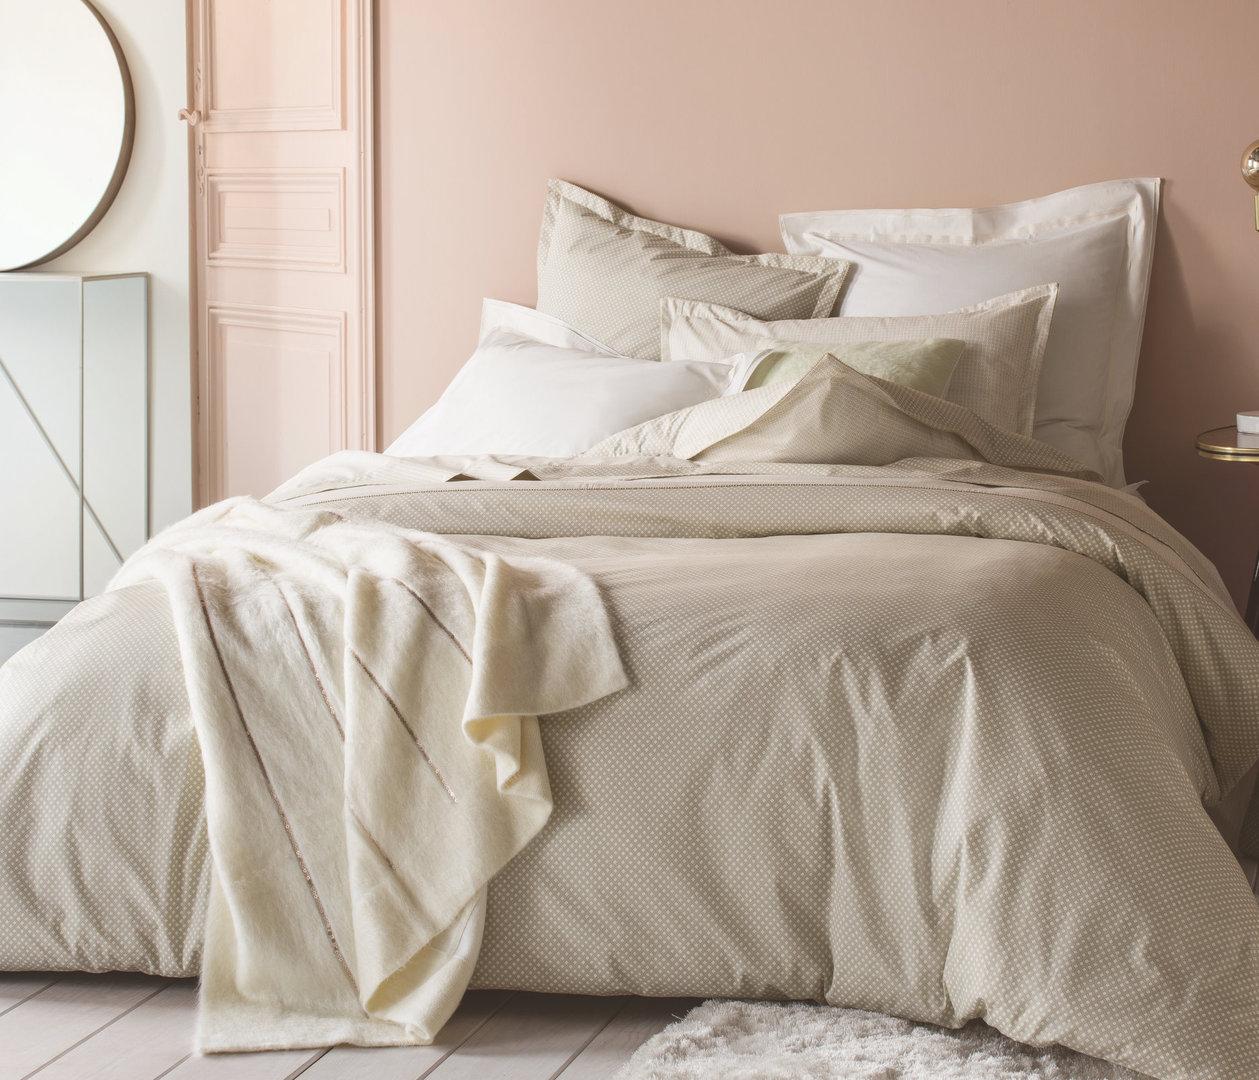 nina ricci mirage perkal bettw sche boudoir. Black Bedroom Furniture Sets. Home Design Ideas